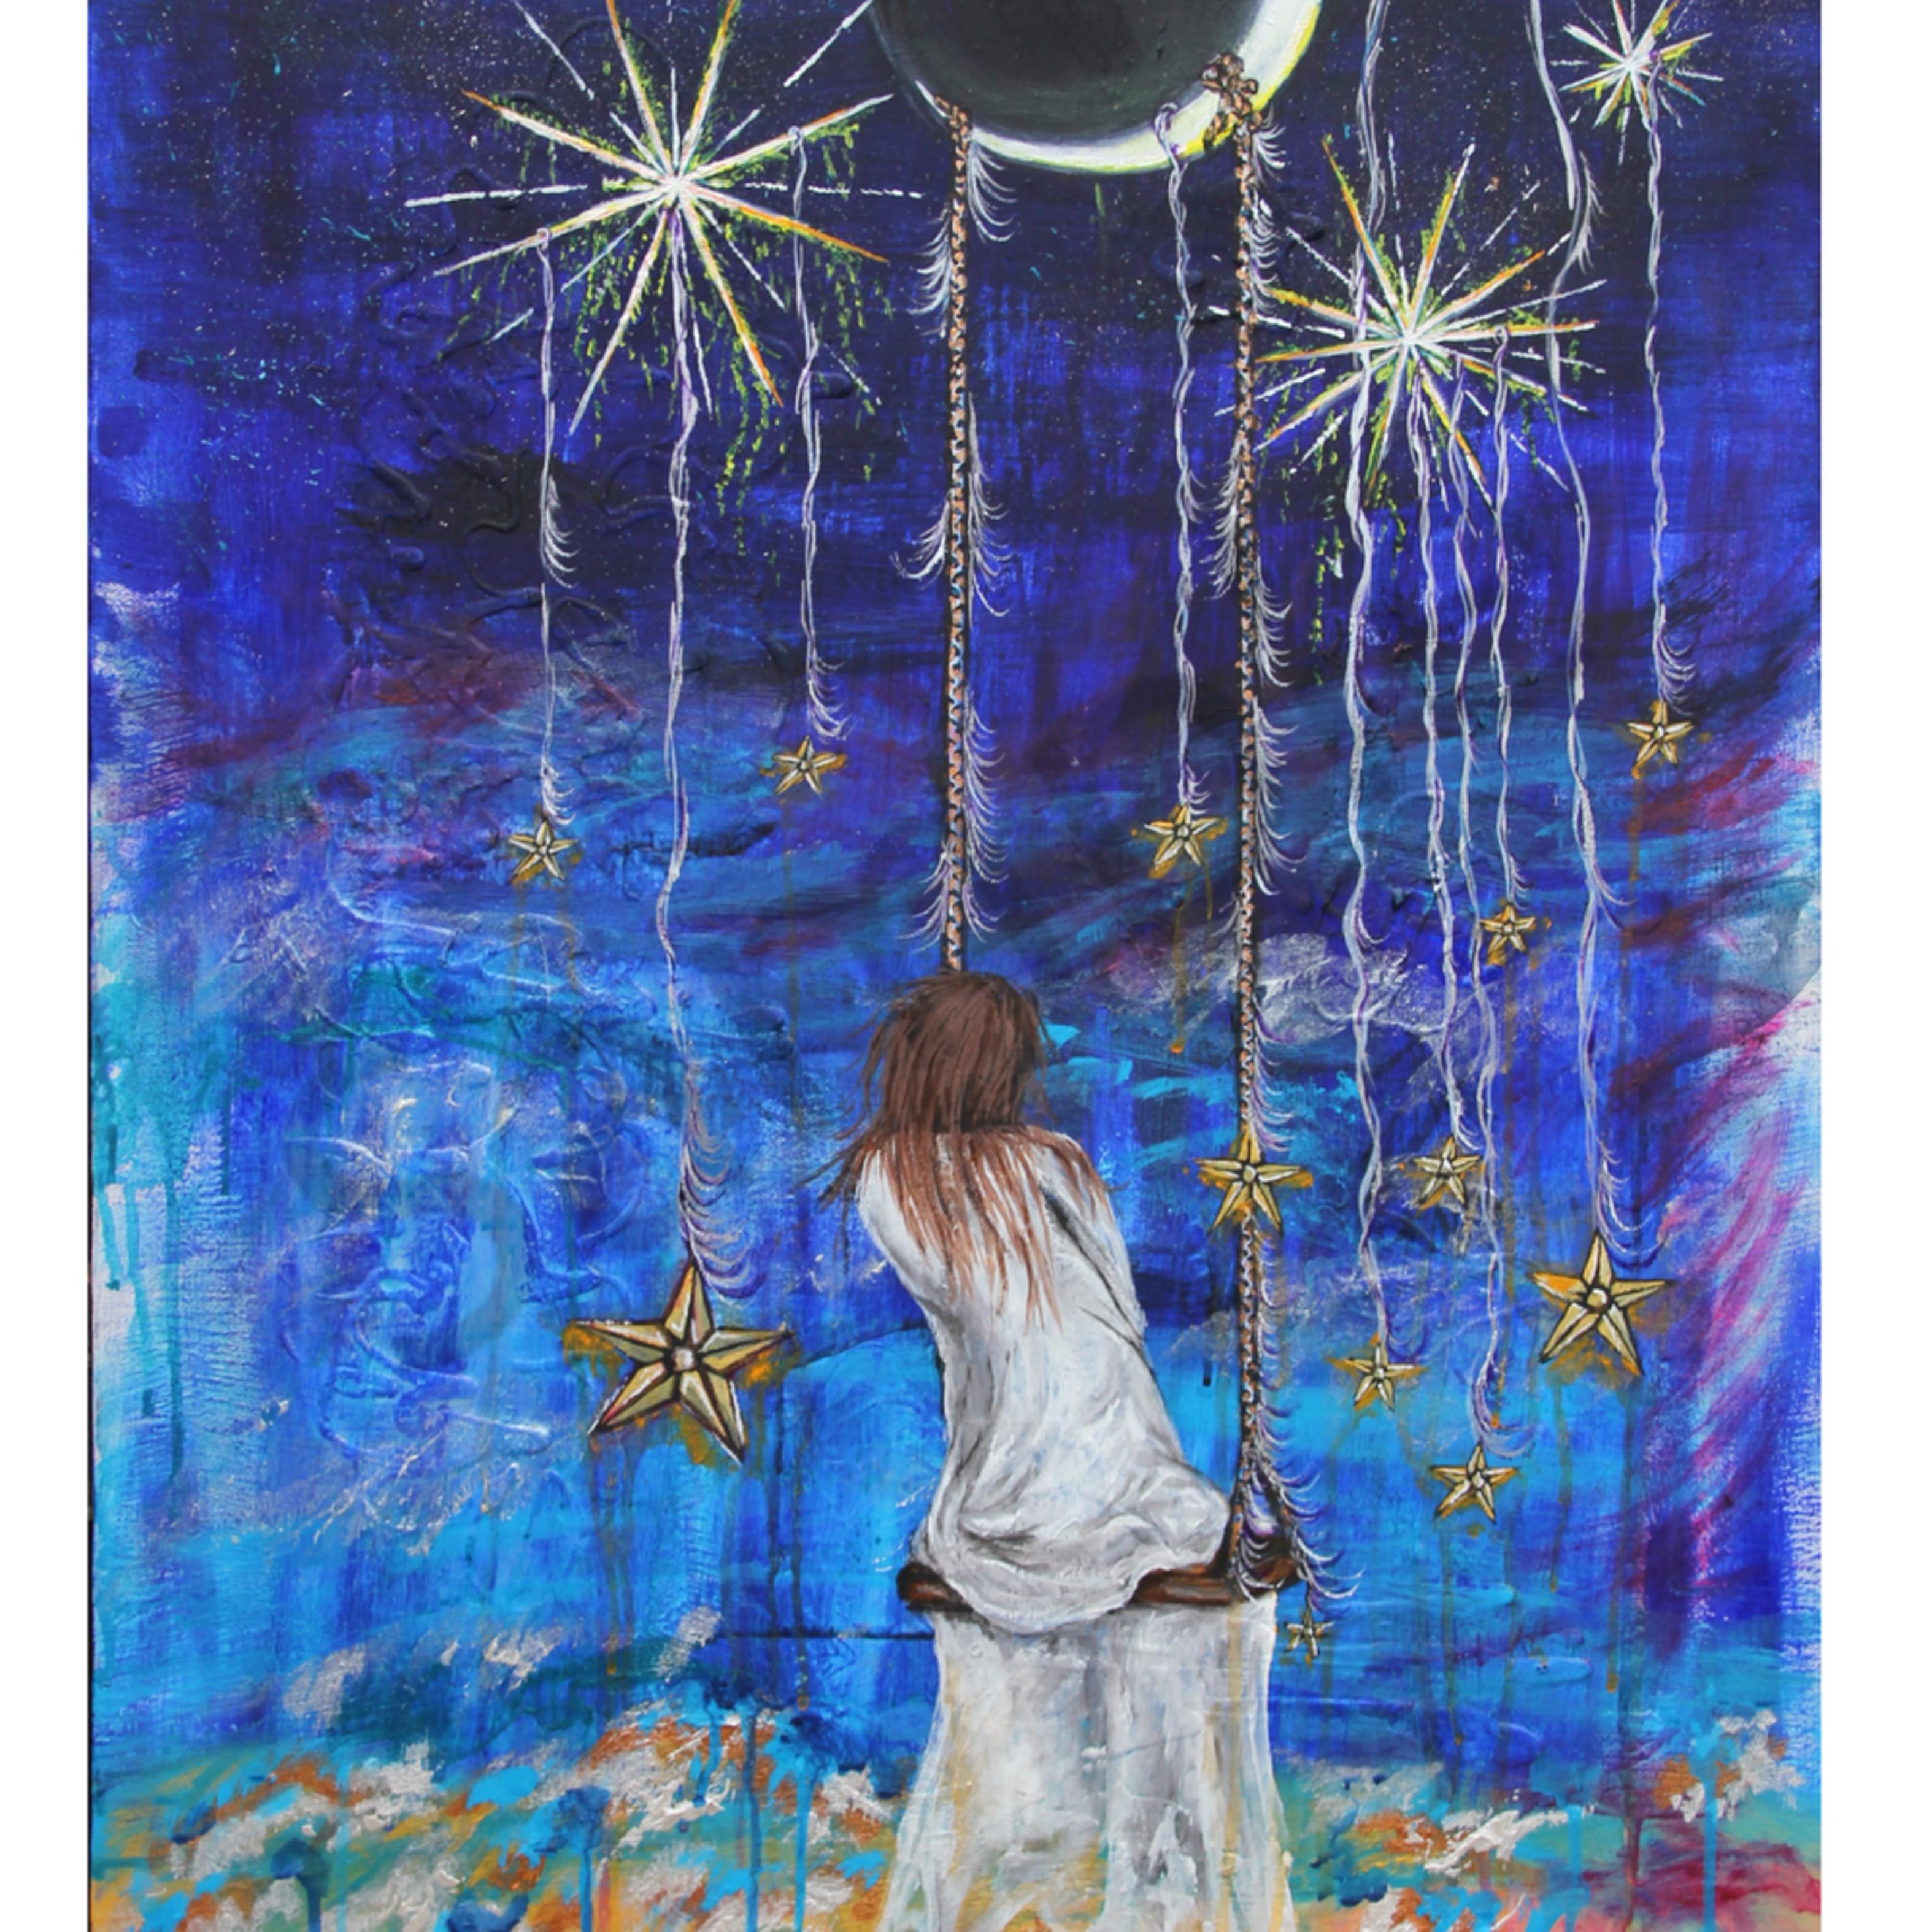 Dream away by megan kasper mzbgjy